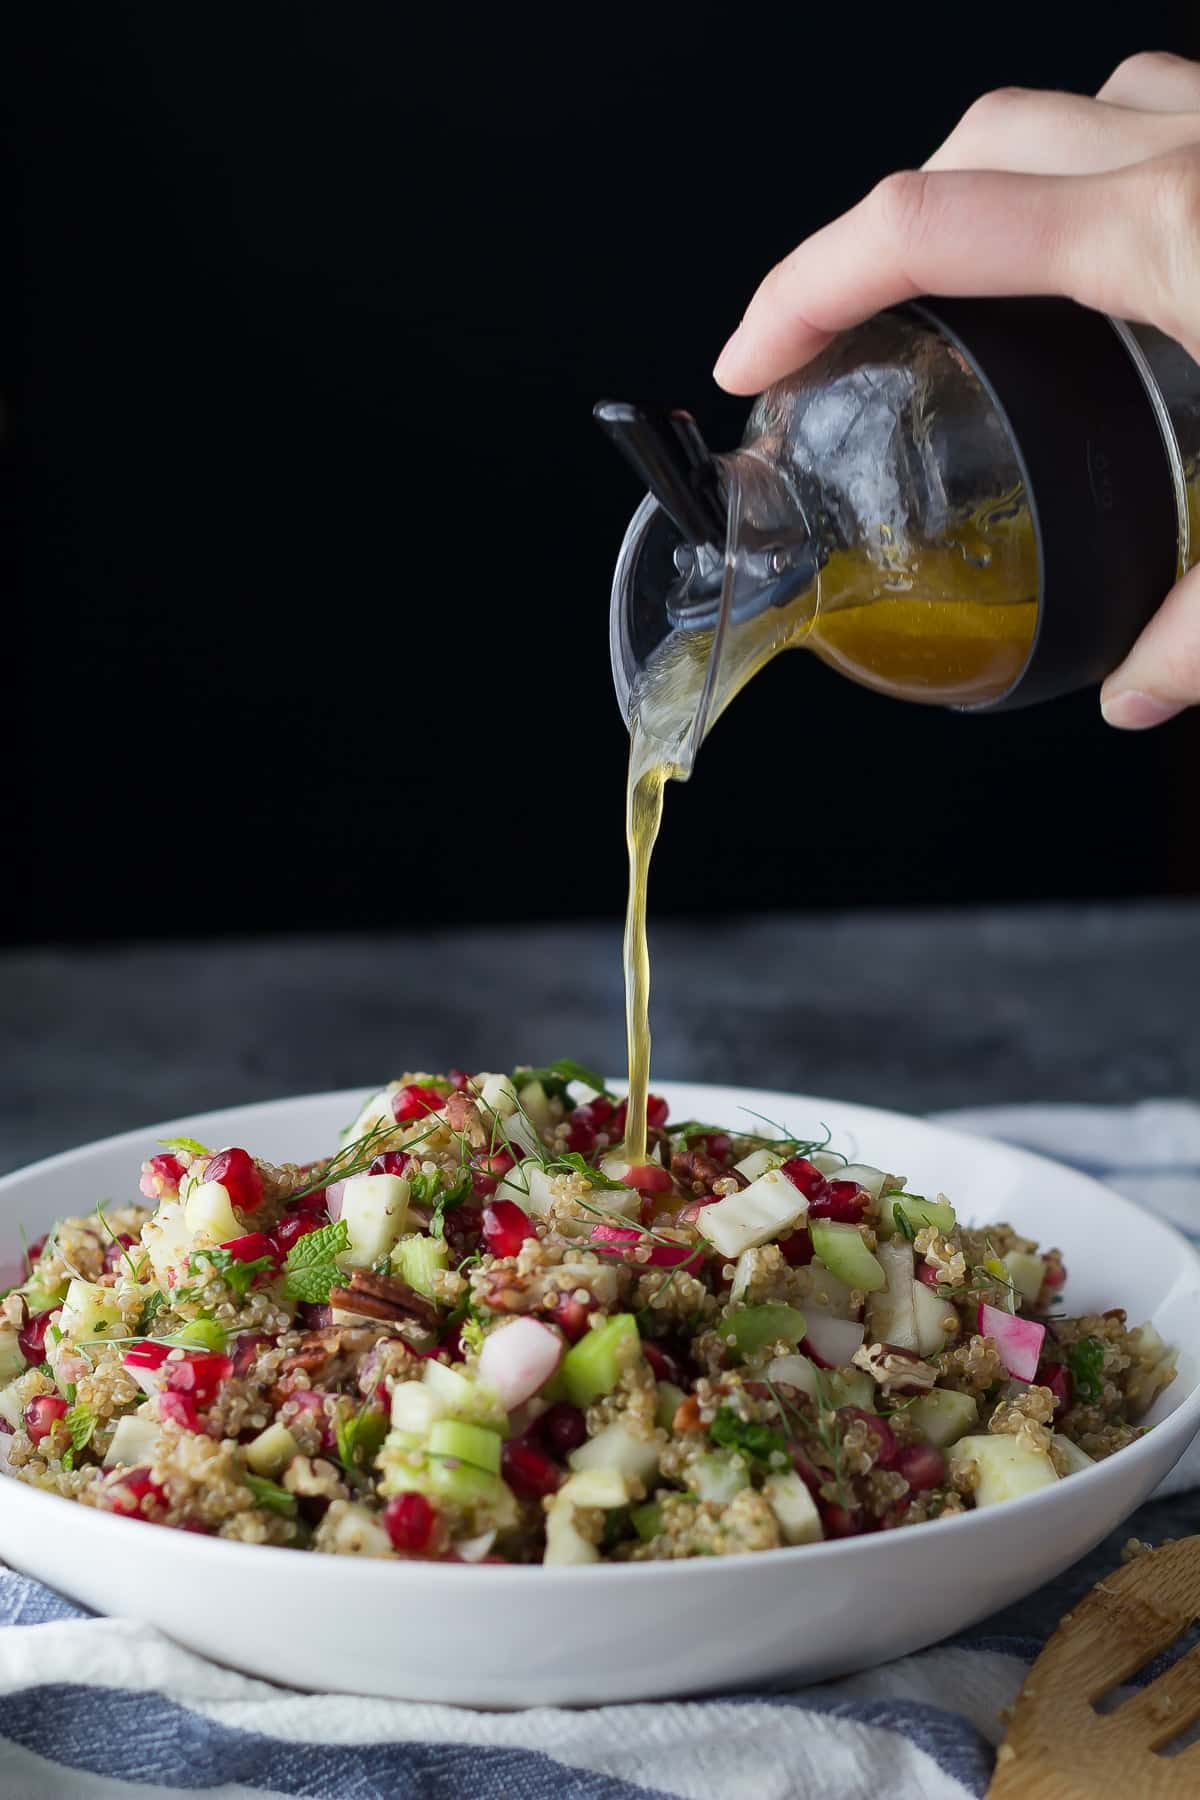 pouring vinaigrette over a bowl holding the fennel quinoa salad